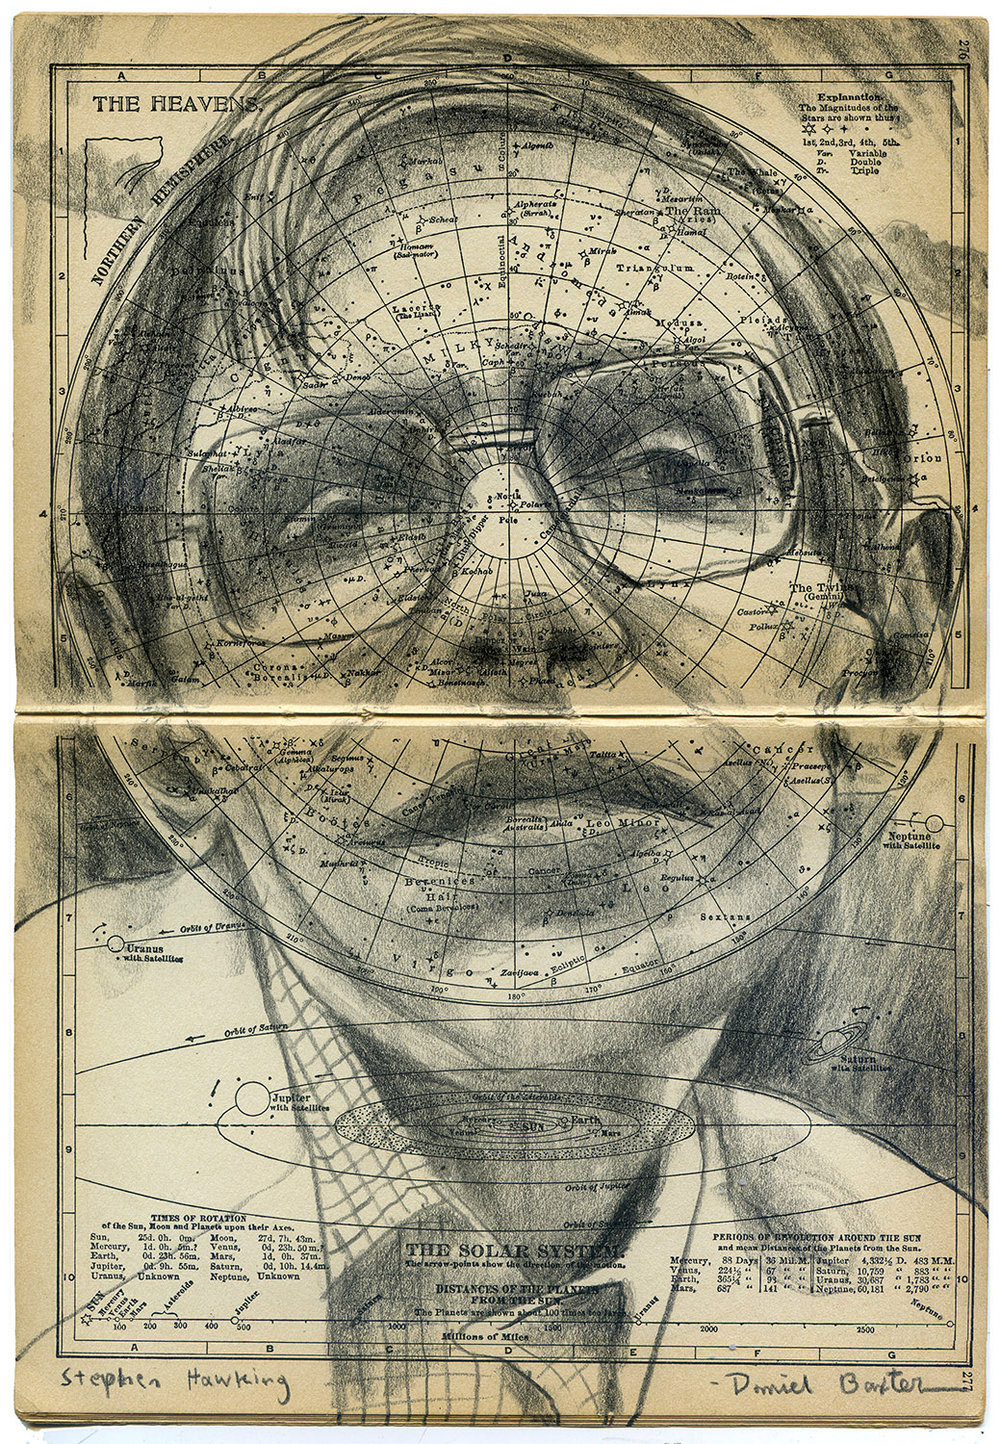 Daniel Baxter Stephen Hawking portrait.jpg